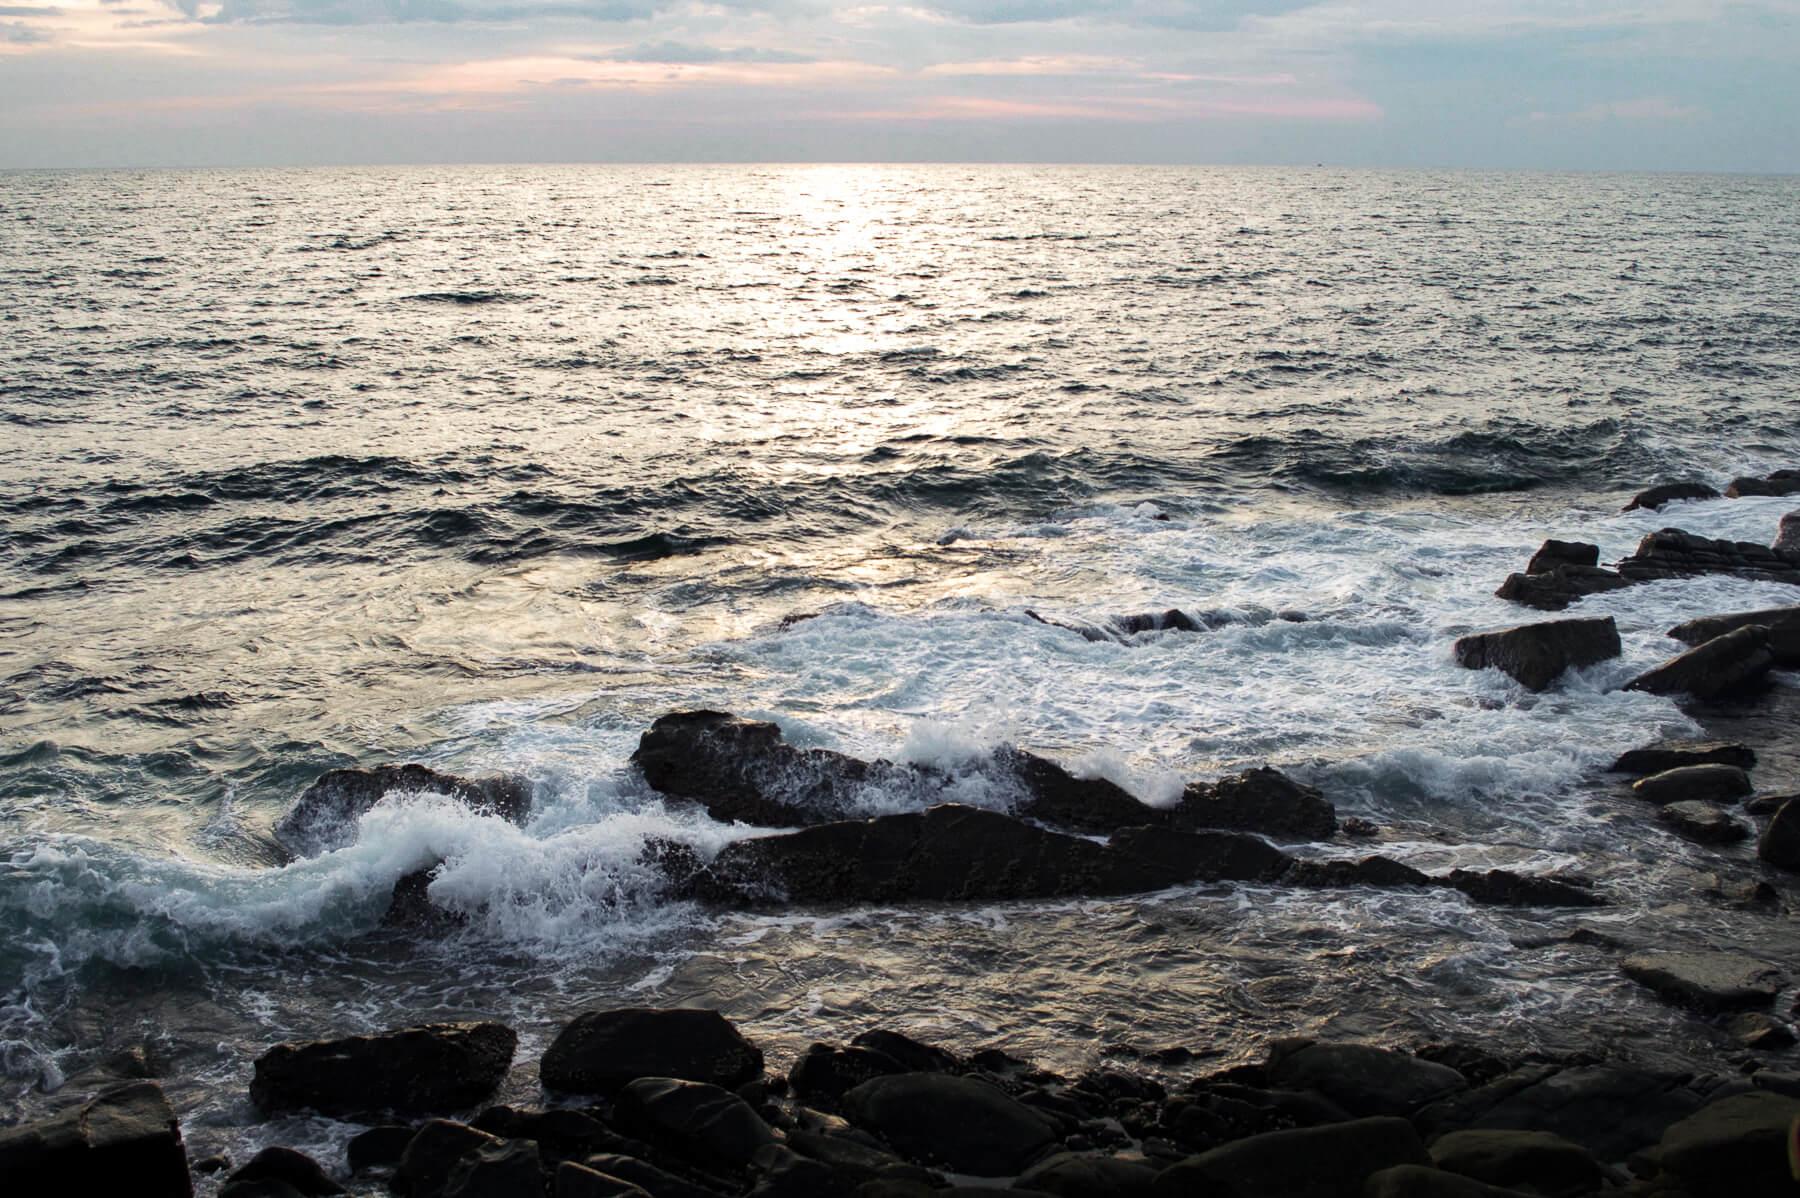 Choppy waves crashing into the rocks